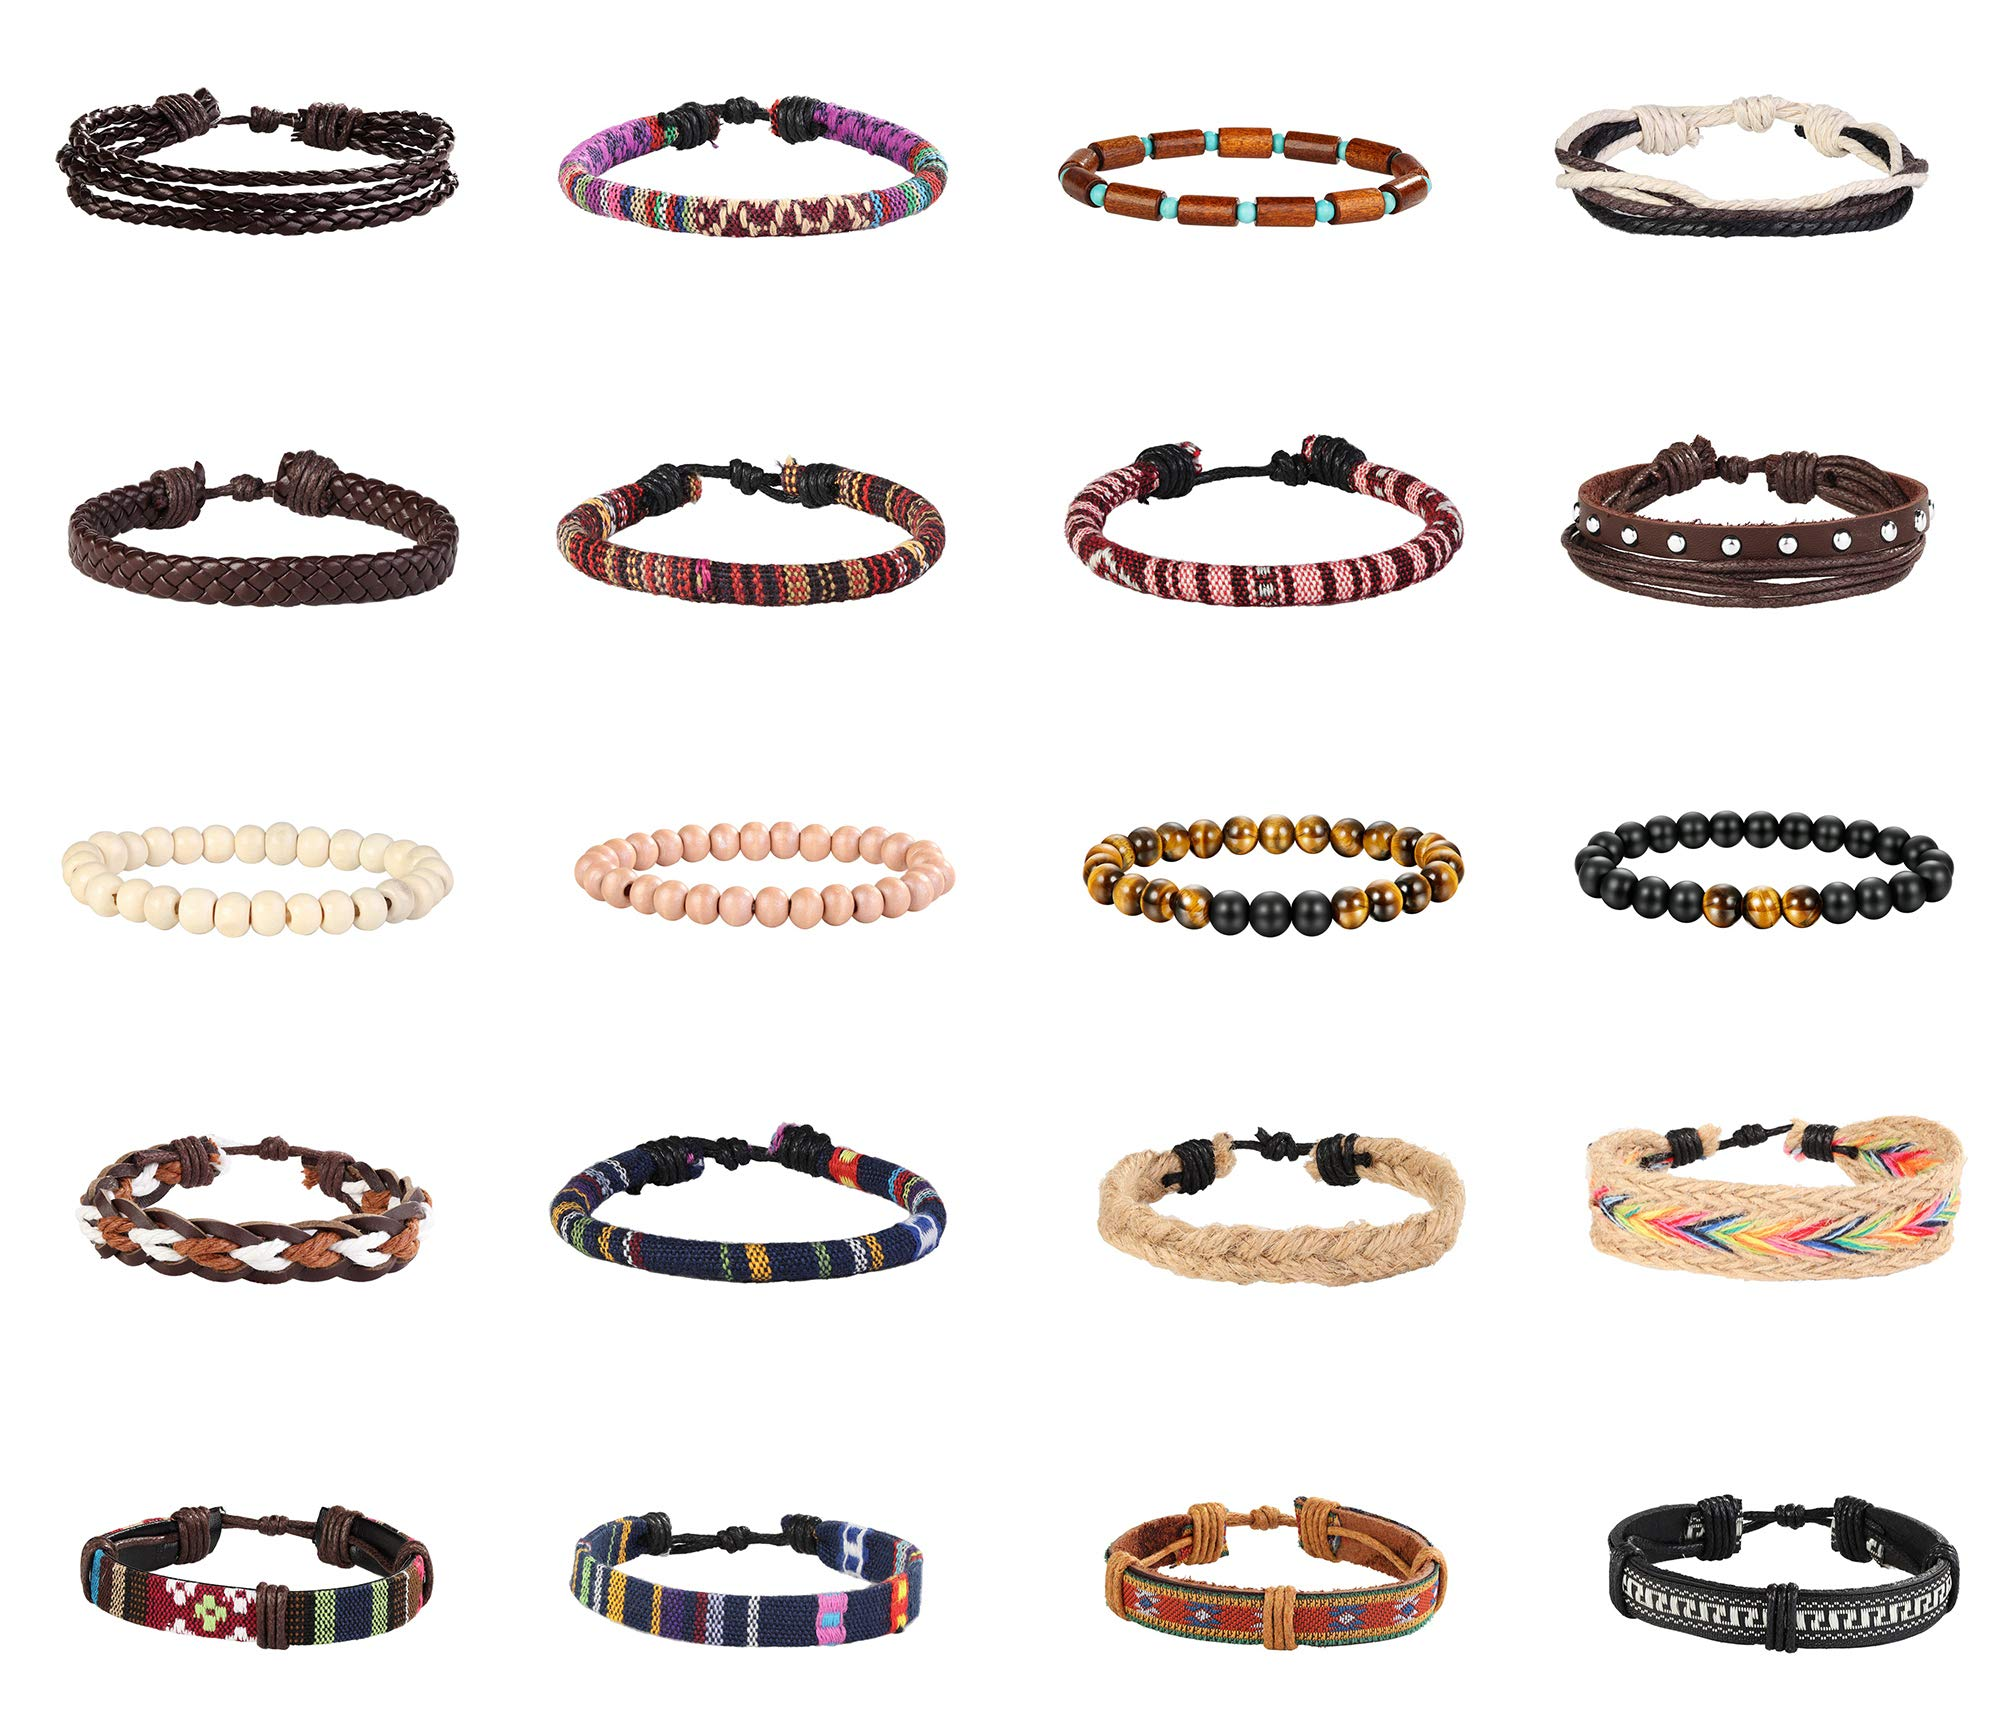 Finrezio 20 Pcs Braided Bracelet Set Women Men Beads Leather Wristbands Boho Ethnic Tribal Linen Hemp Cords Wrap Bracelets String Handmade Jewelry (Style A:20 Pcs) by Finrezio